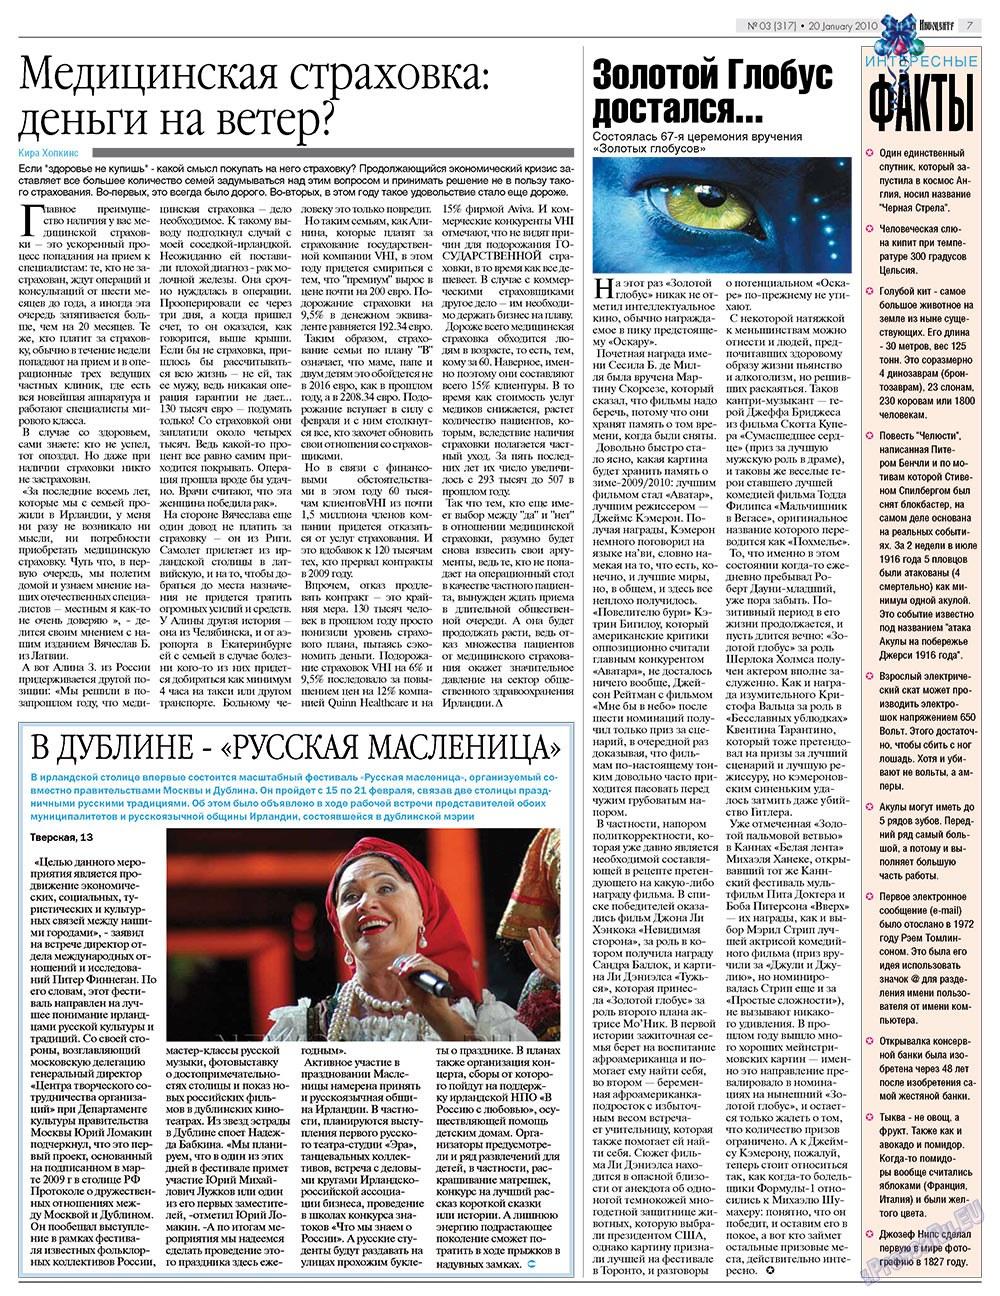 Дублин инфоцентр (газета). 2010 год, номер 3, стр. 7